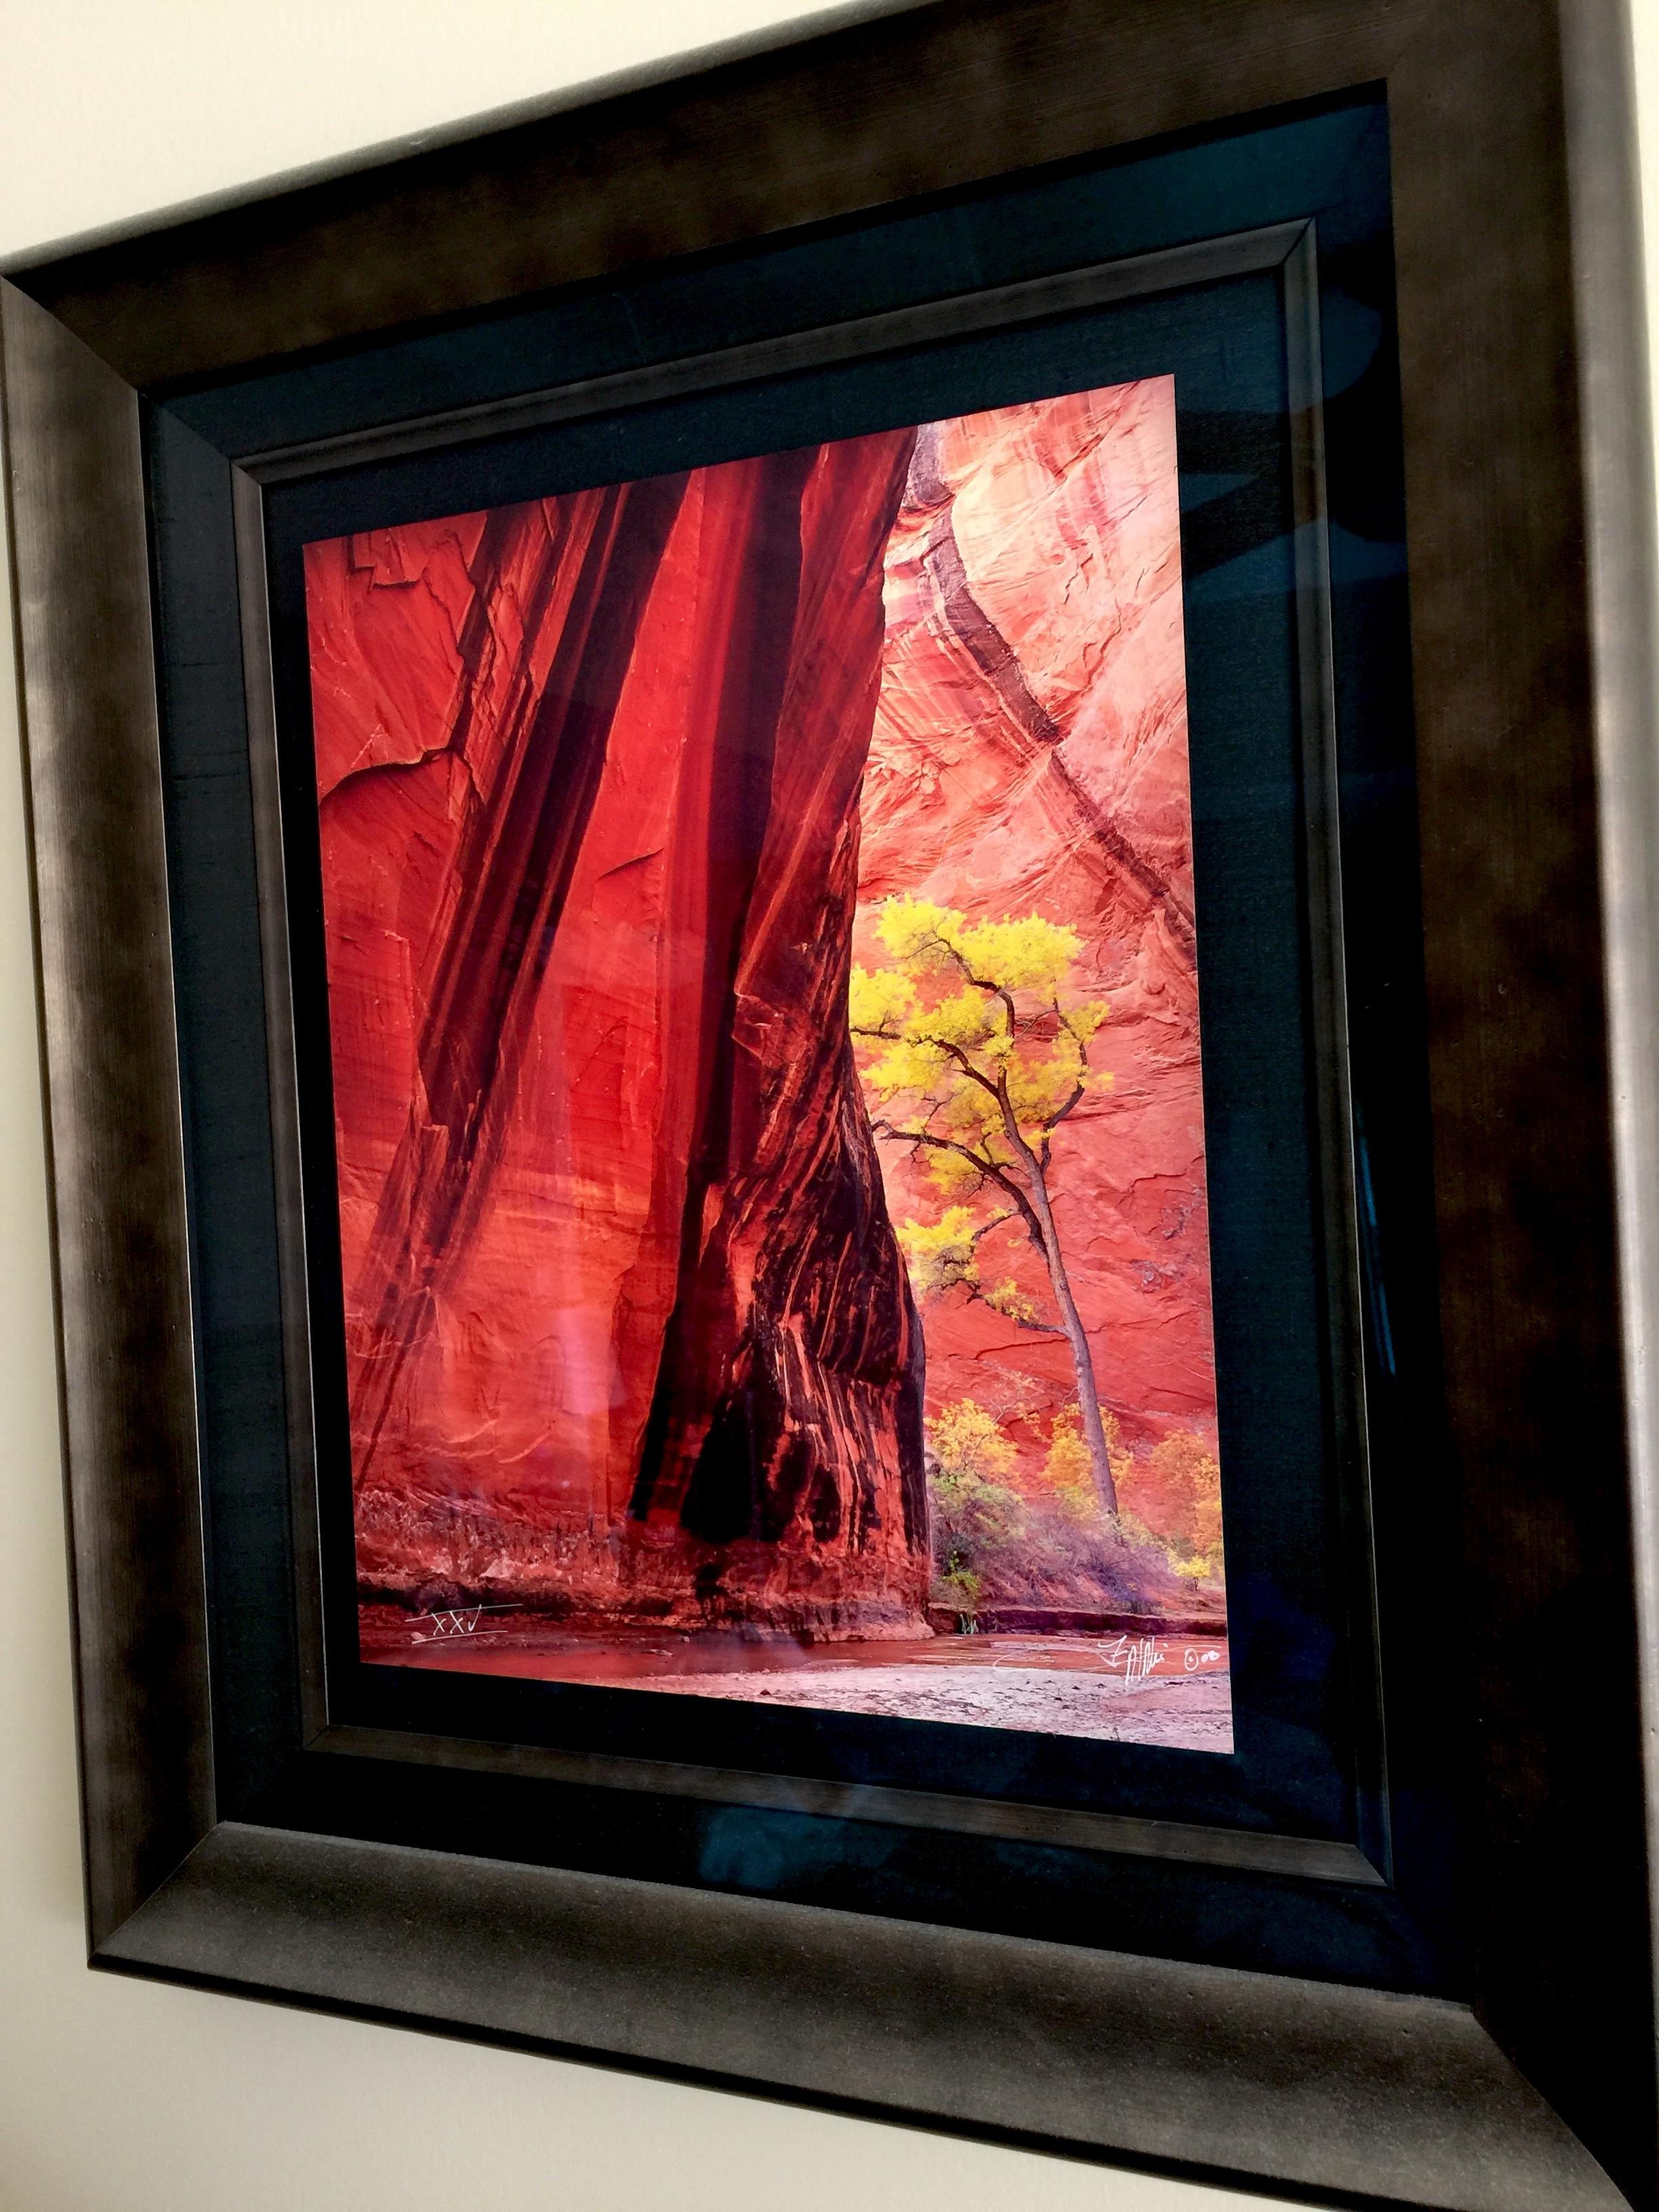 Ikea Ribba frames -- no glass: Open Talk Forum: Digital Photography ...